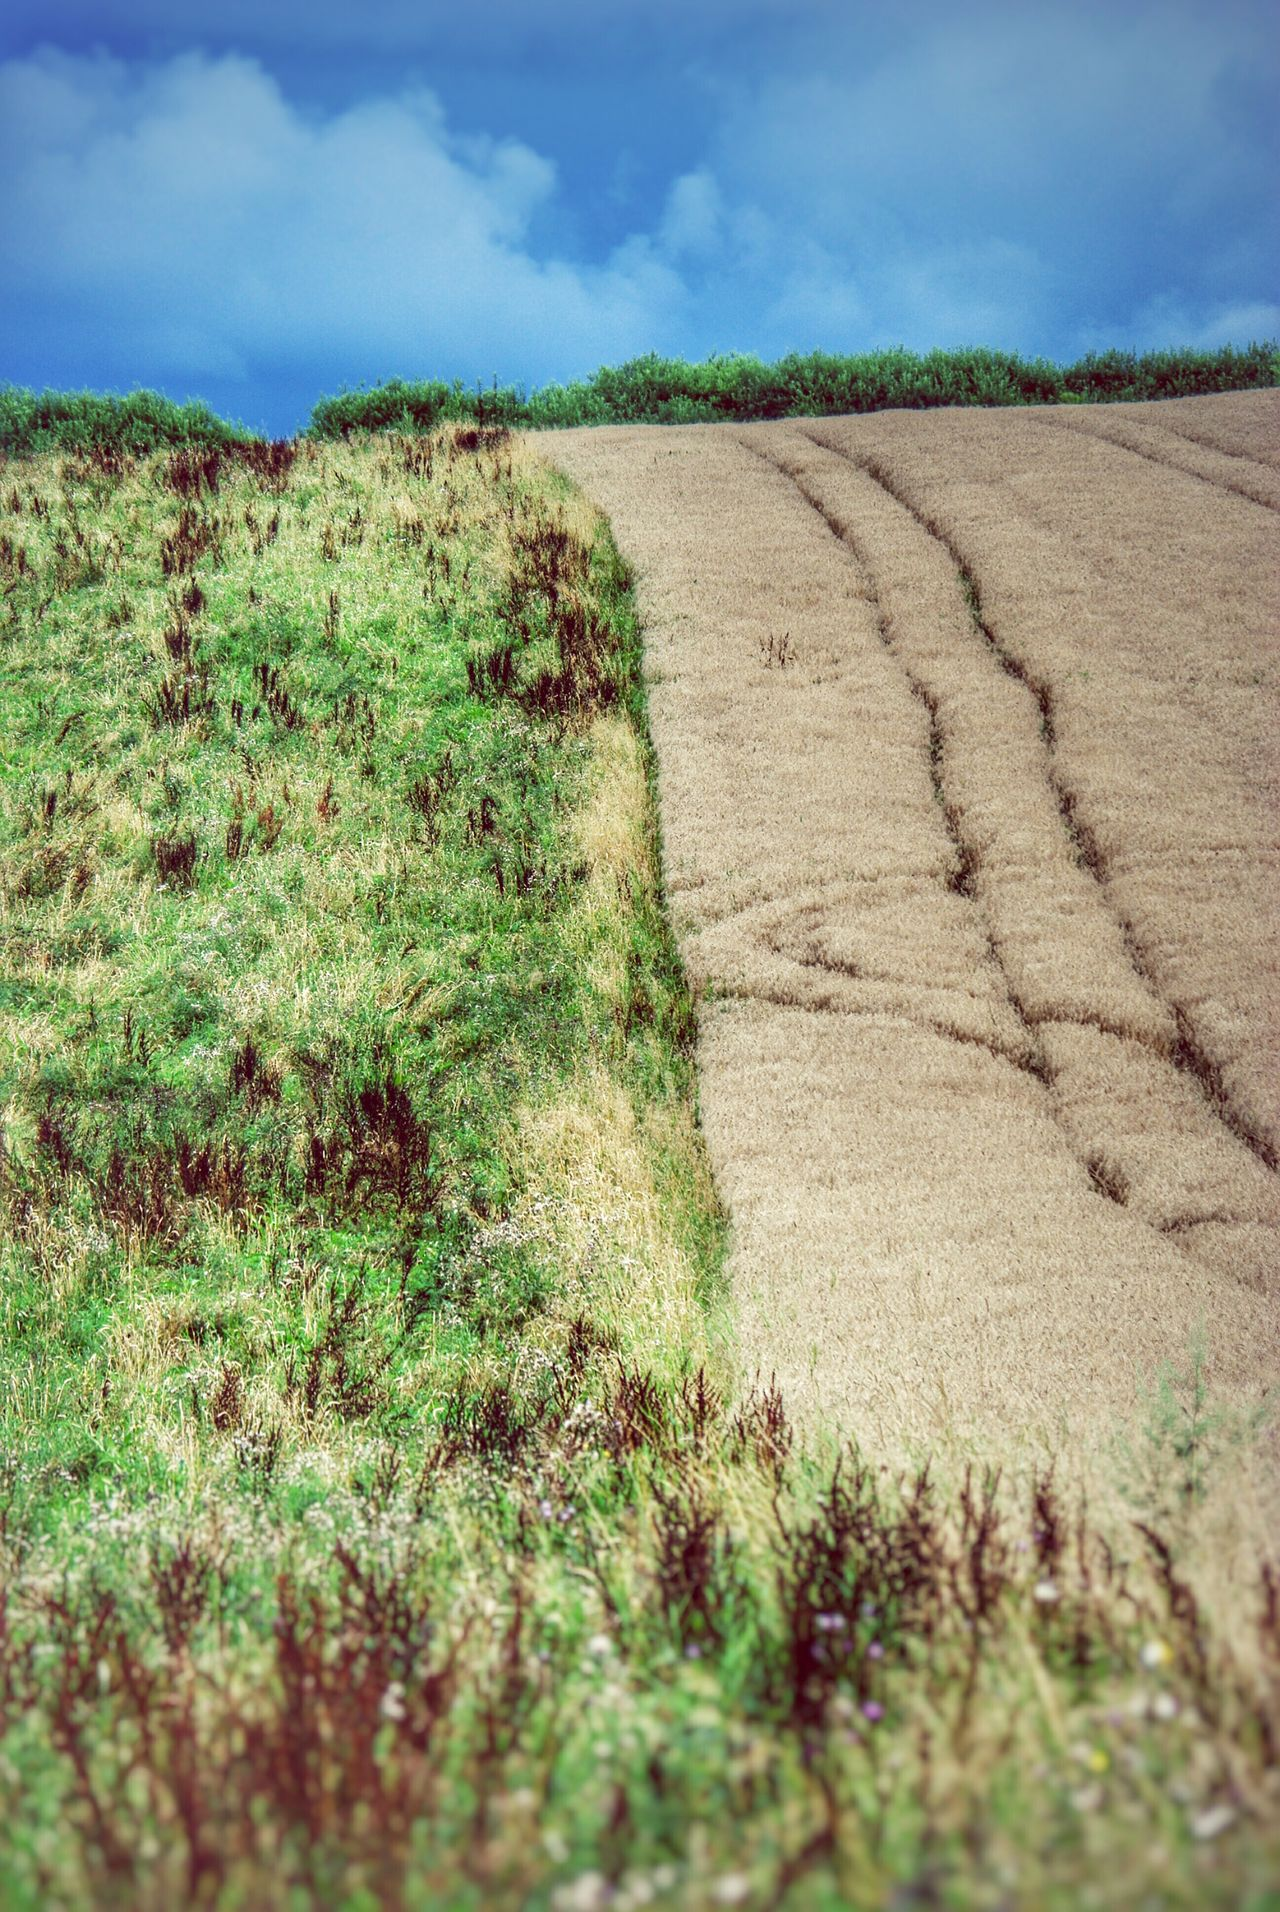 Fields Fieldscape Nature Pattern Grassfield Cornfield Tracks Hill Horizon Bluesky Landscape Landscapes With WhiteWall